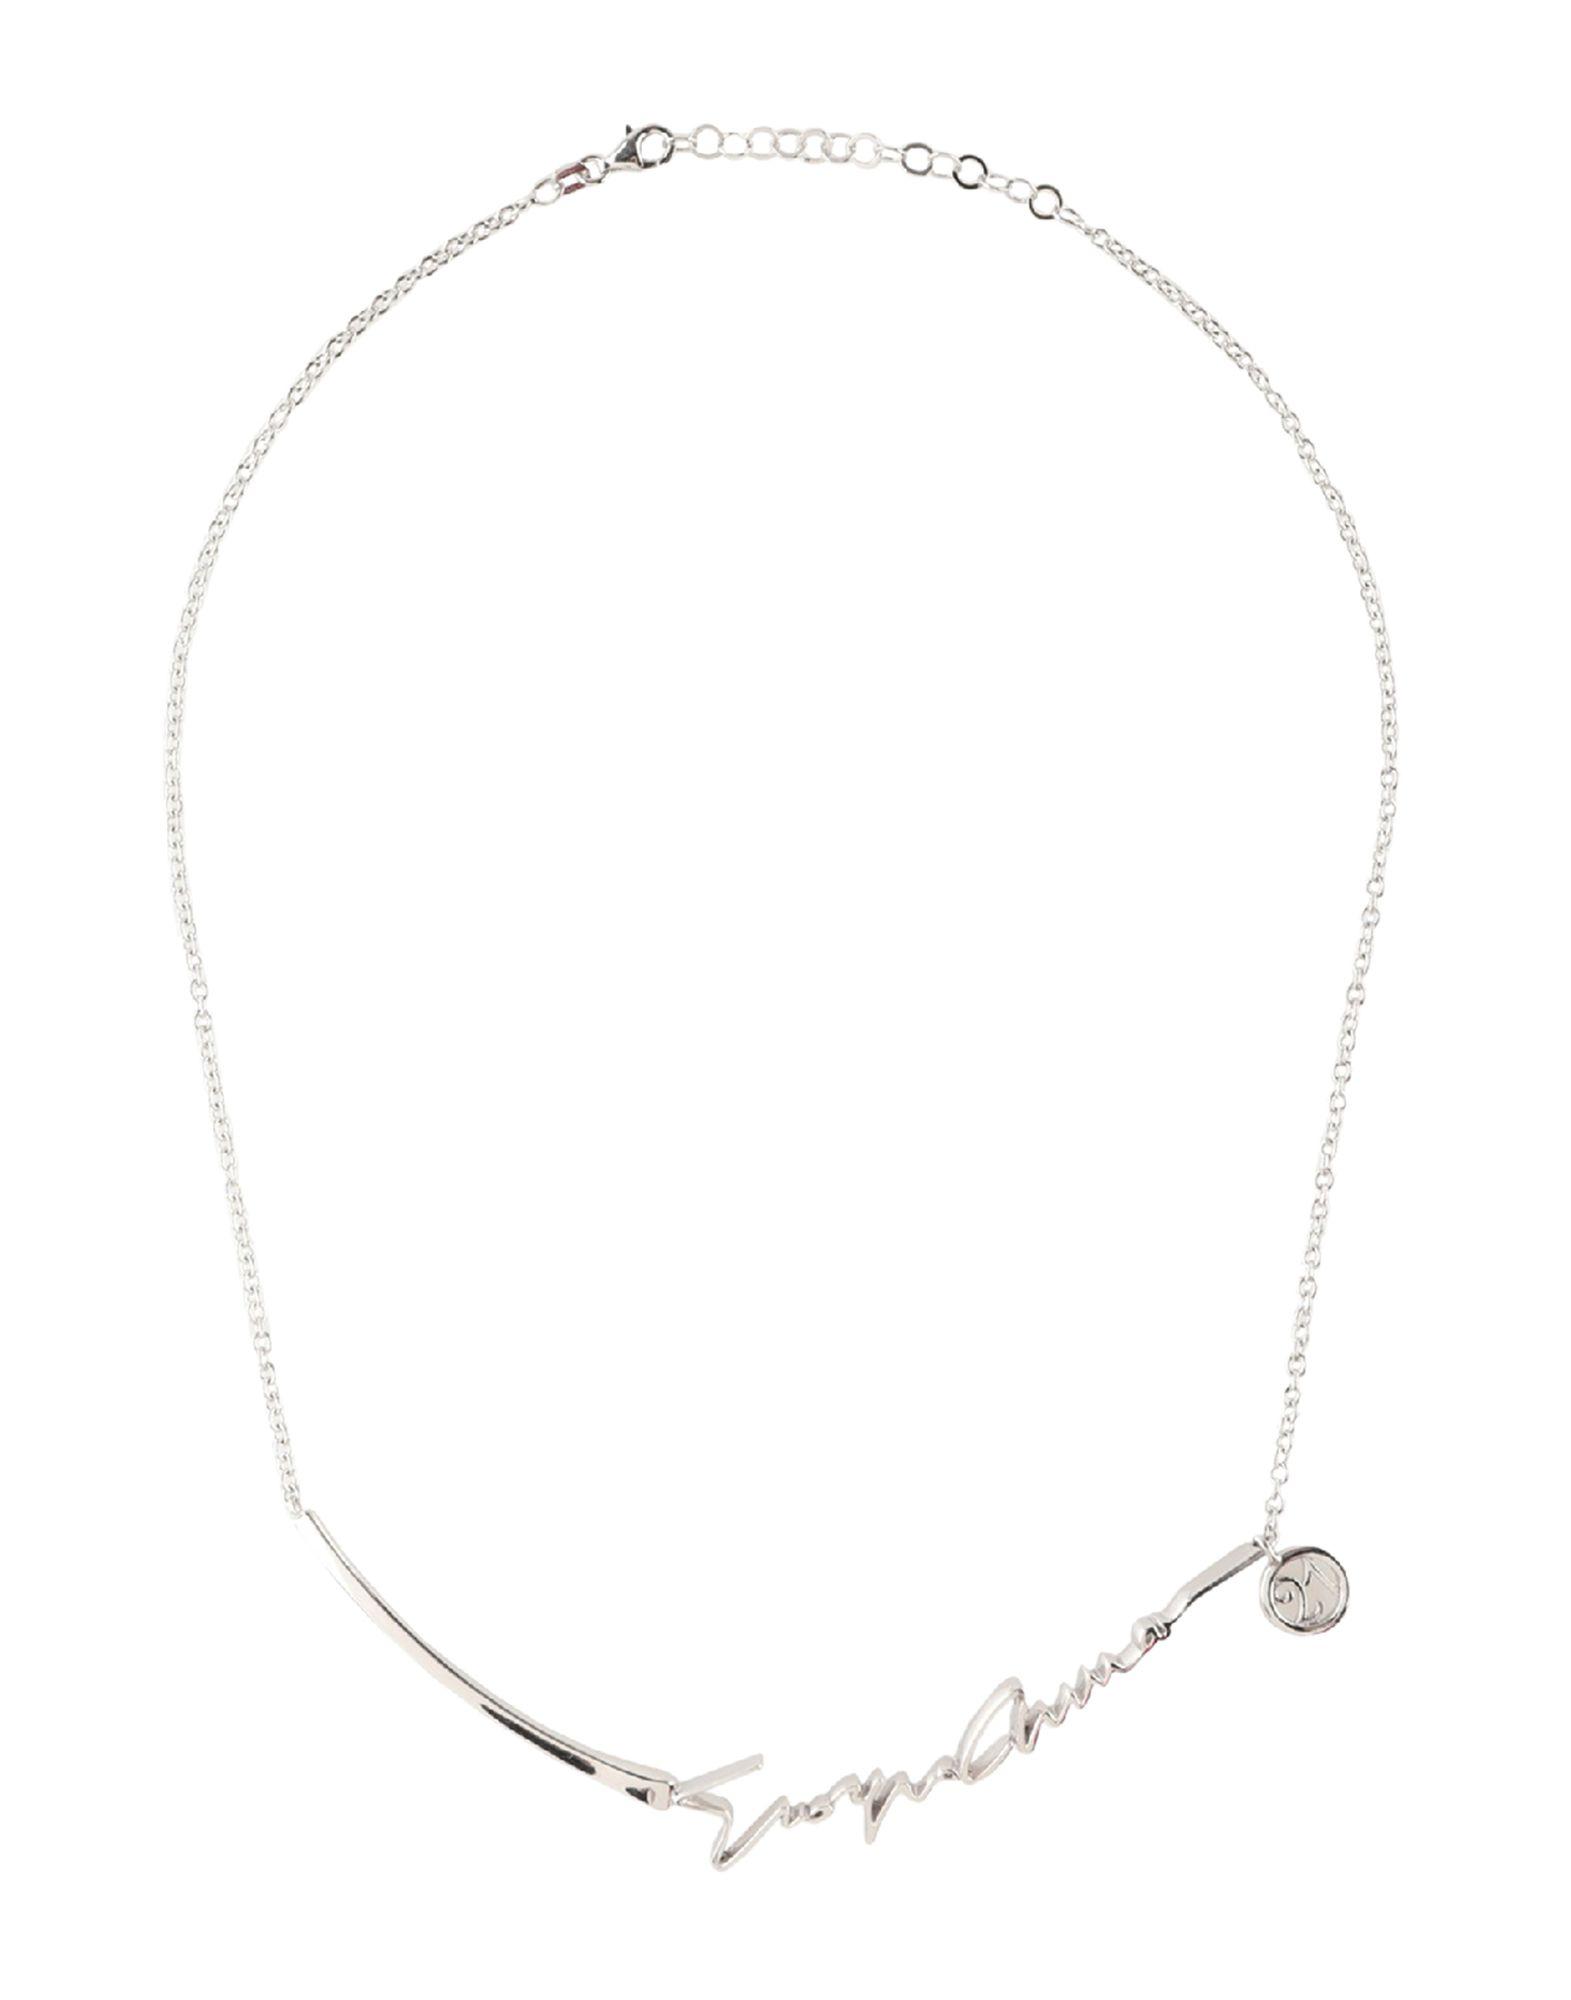 GIORGIO ARMANI Necklaces. logo, hook fastening. Silver